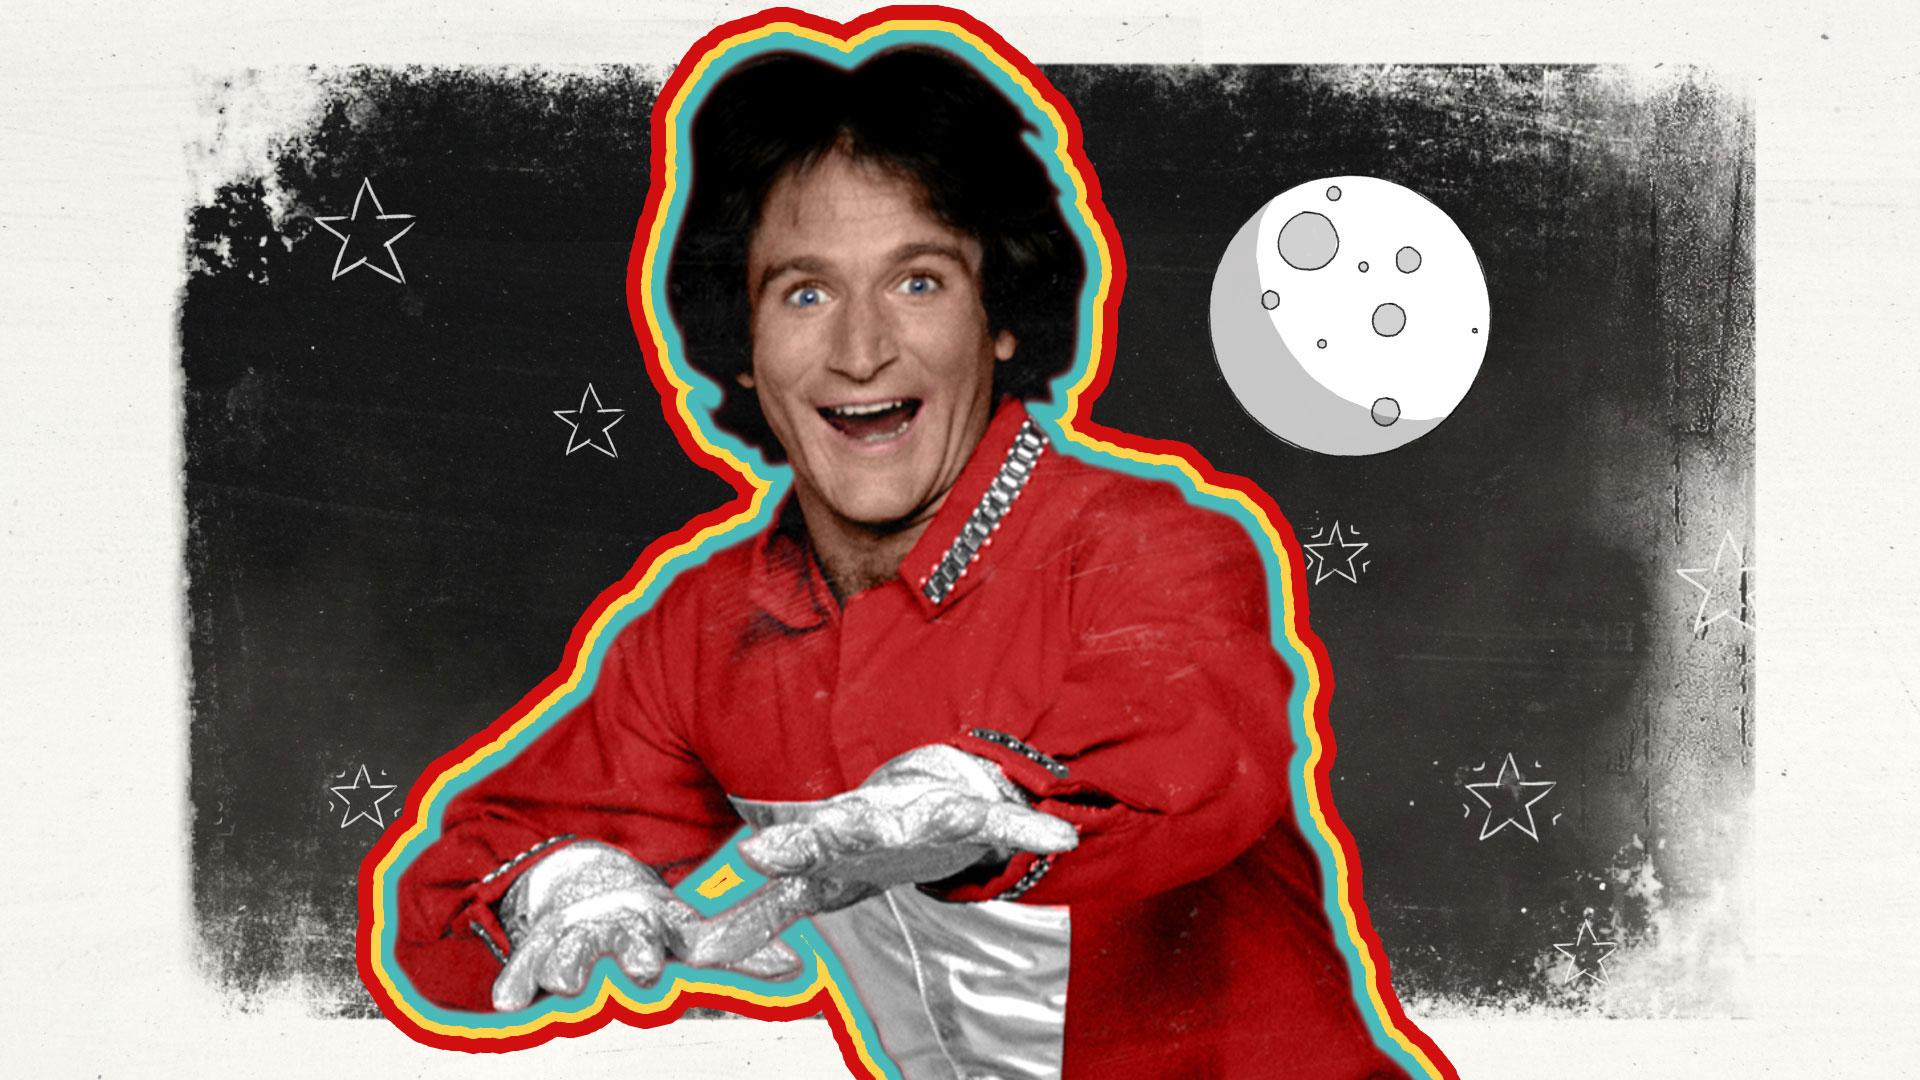 Biography: Robin Williams